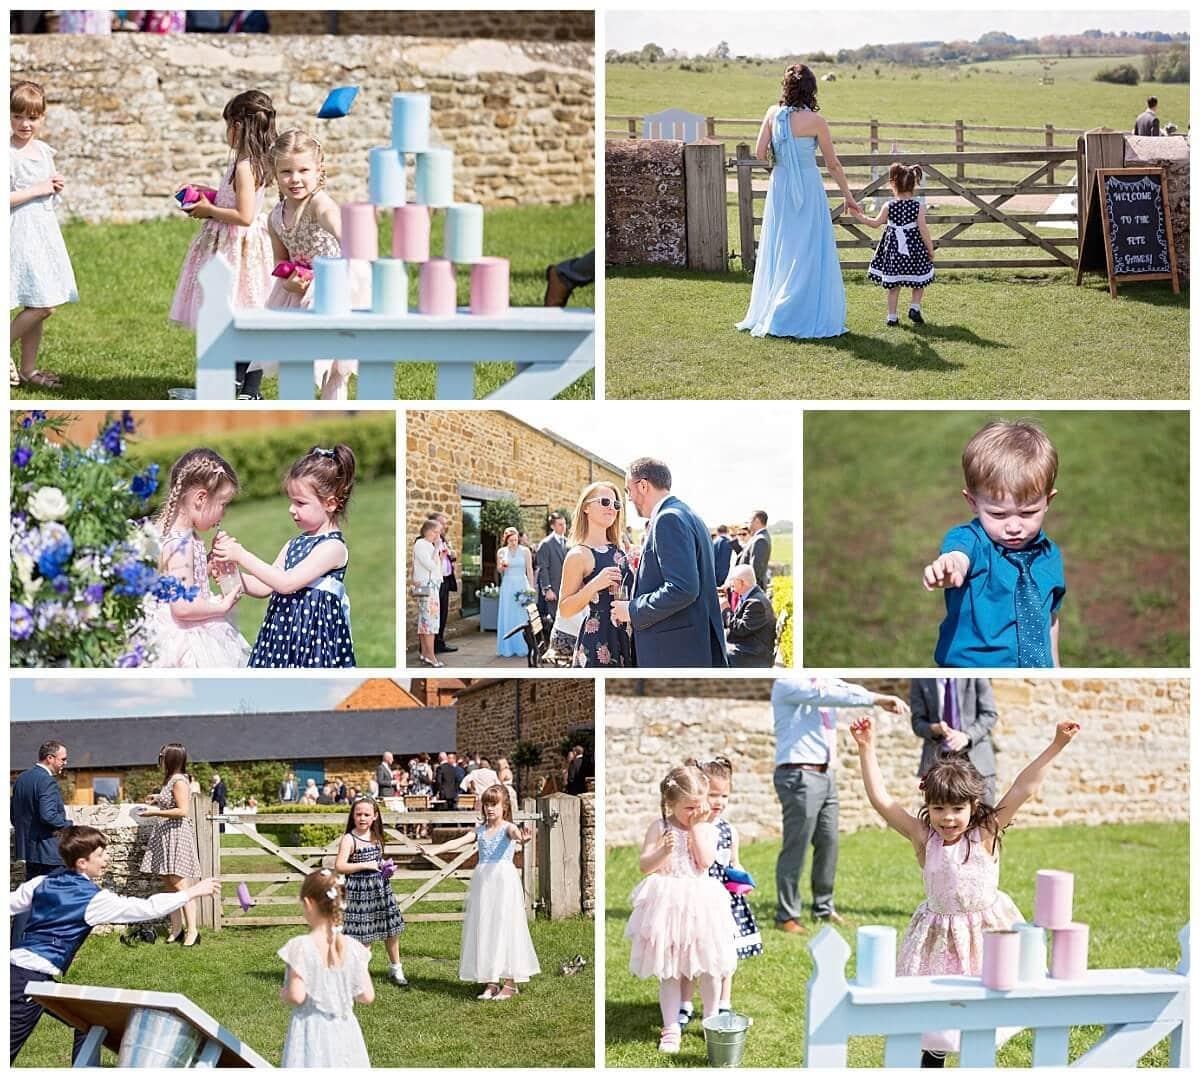 Garden Games at Dodford Manor Wedding Reception